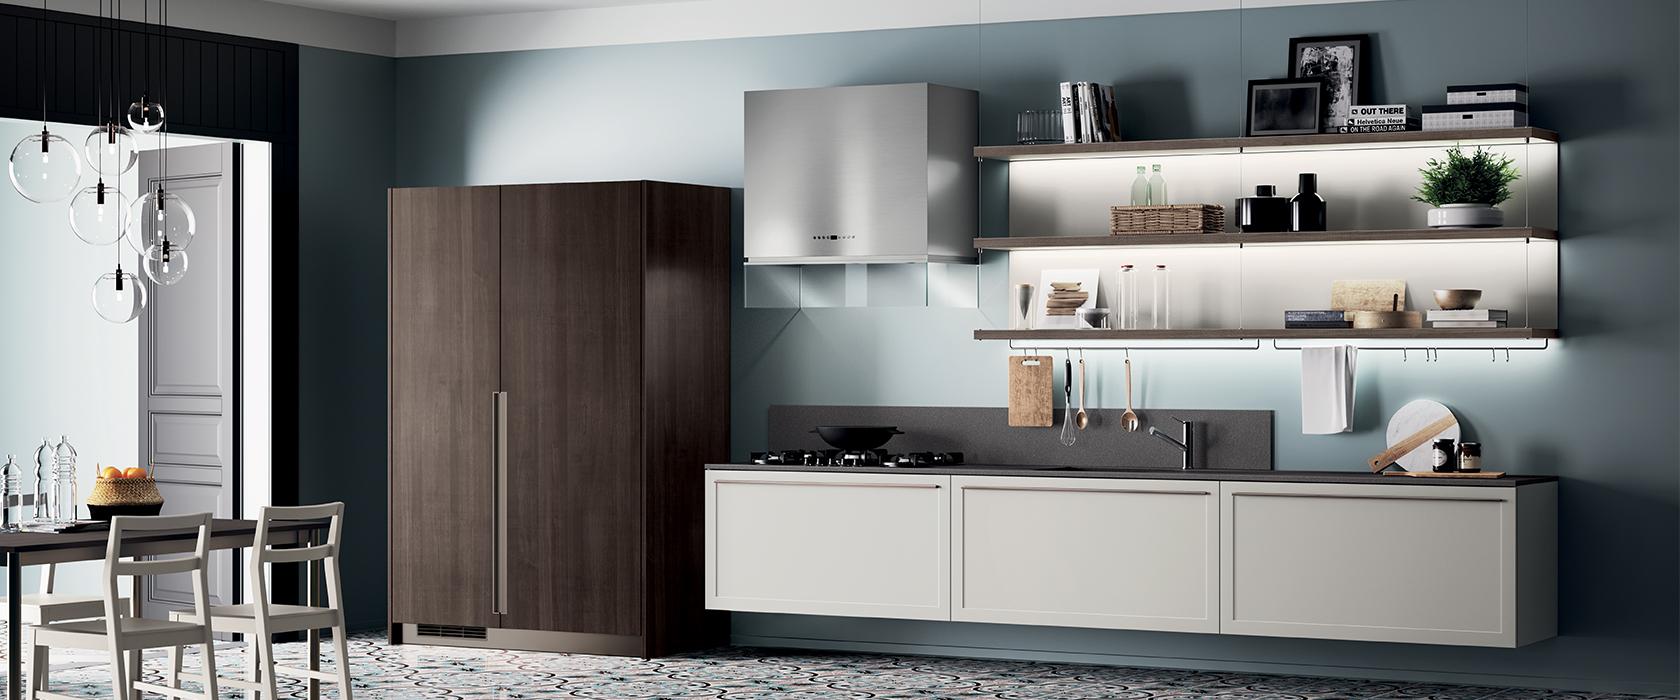 Cucina Moderna Scavolini Carattere-Mobili Incardone-Mobili Incardone